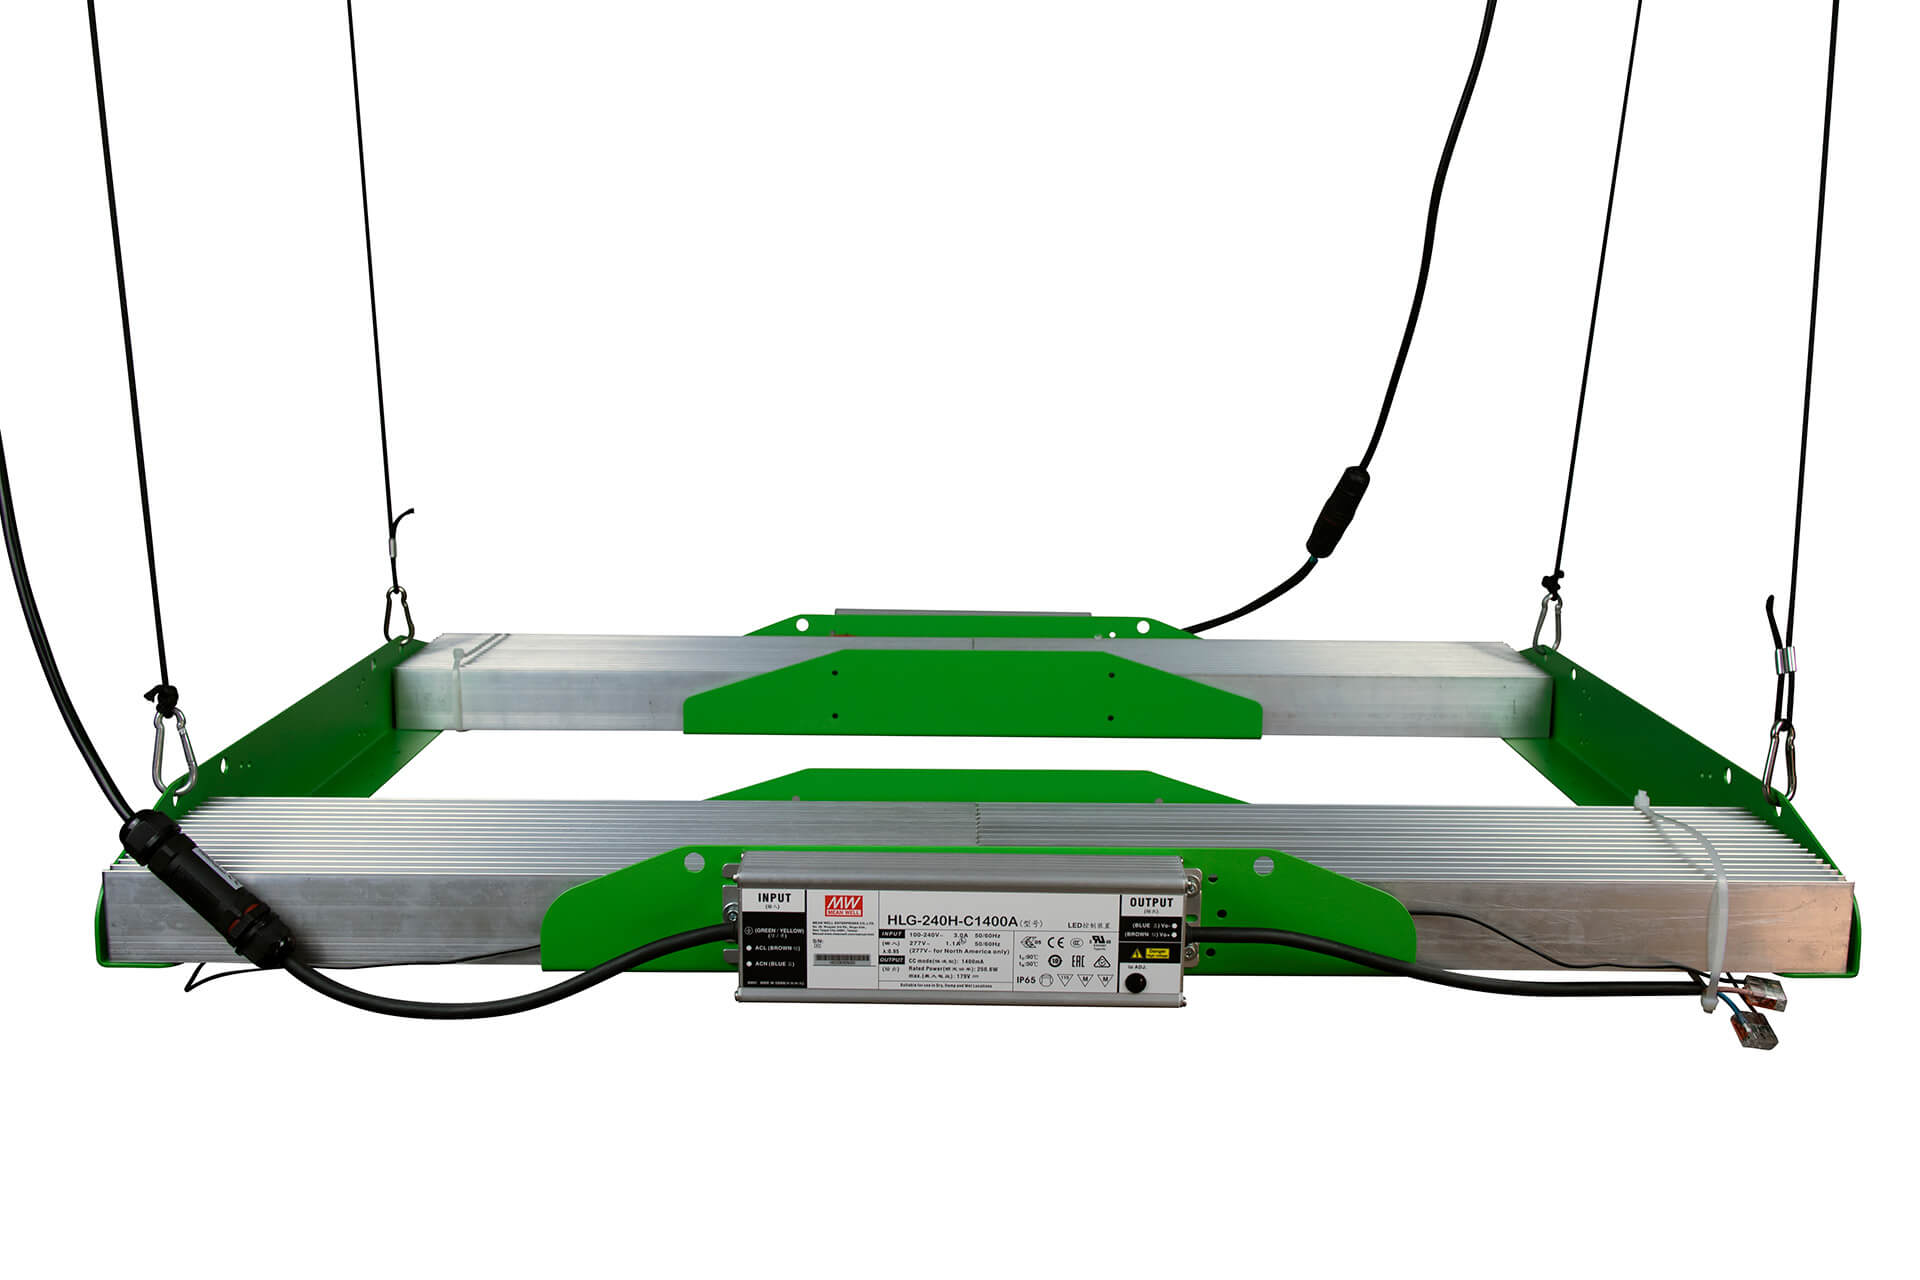 diy-m-kit-smd-400w-front-pro-emit[1]